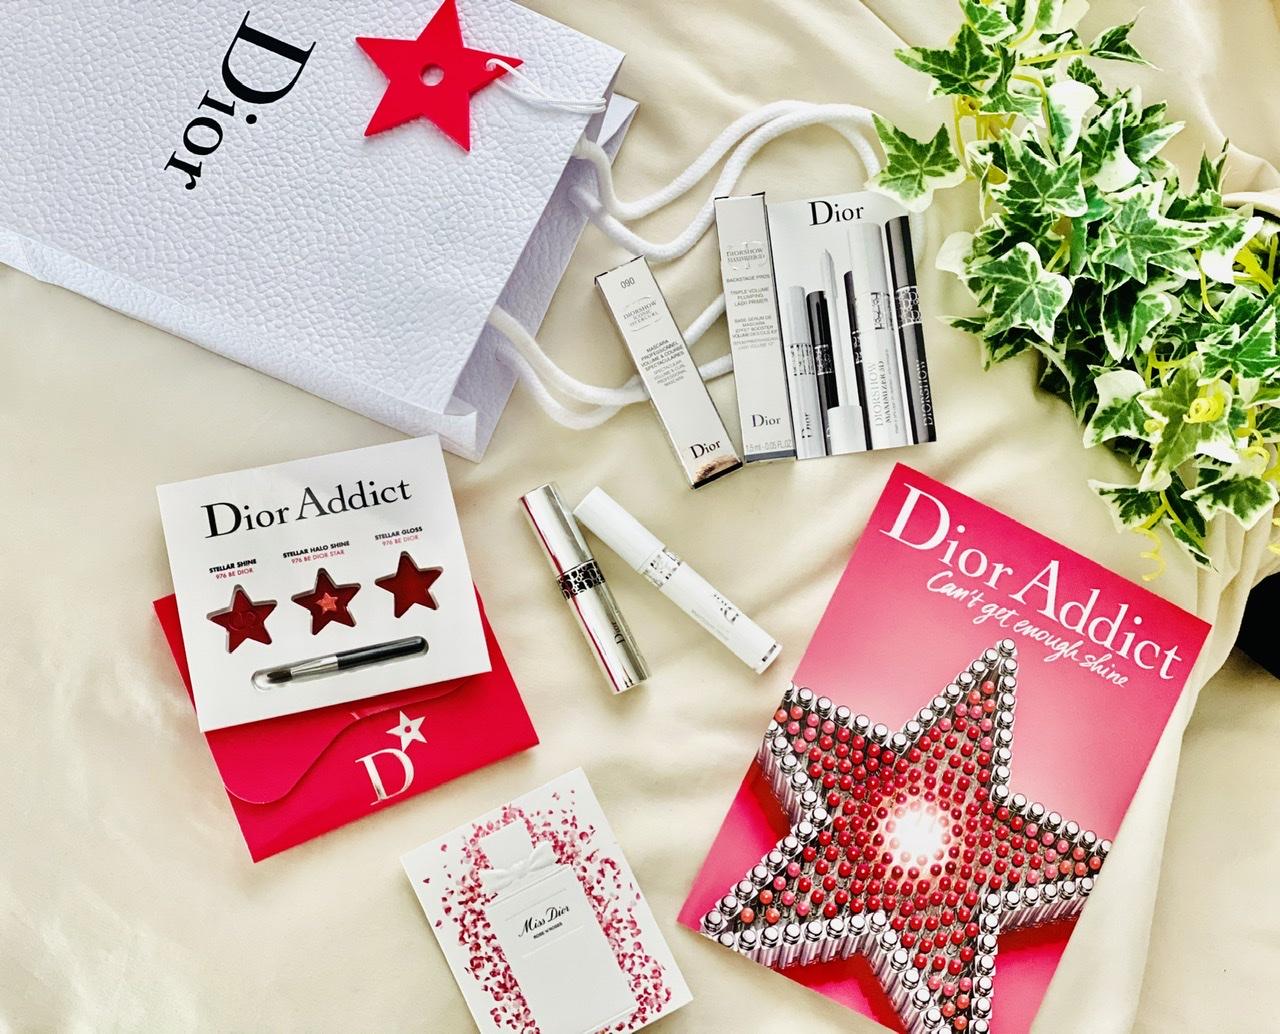 【Dior】豪華お土産付★新作リップをひと足早くお試し!連日大盛況のポップアップイベントへ♡_10